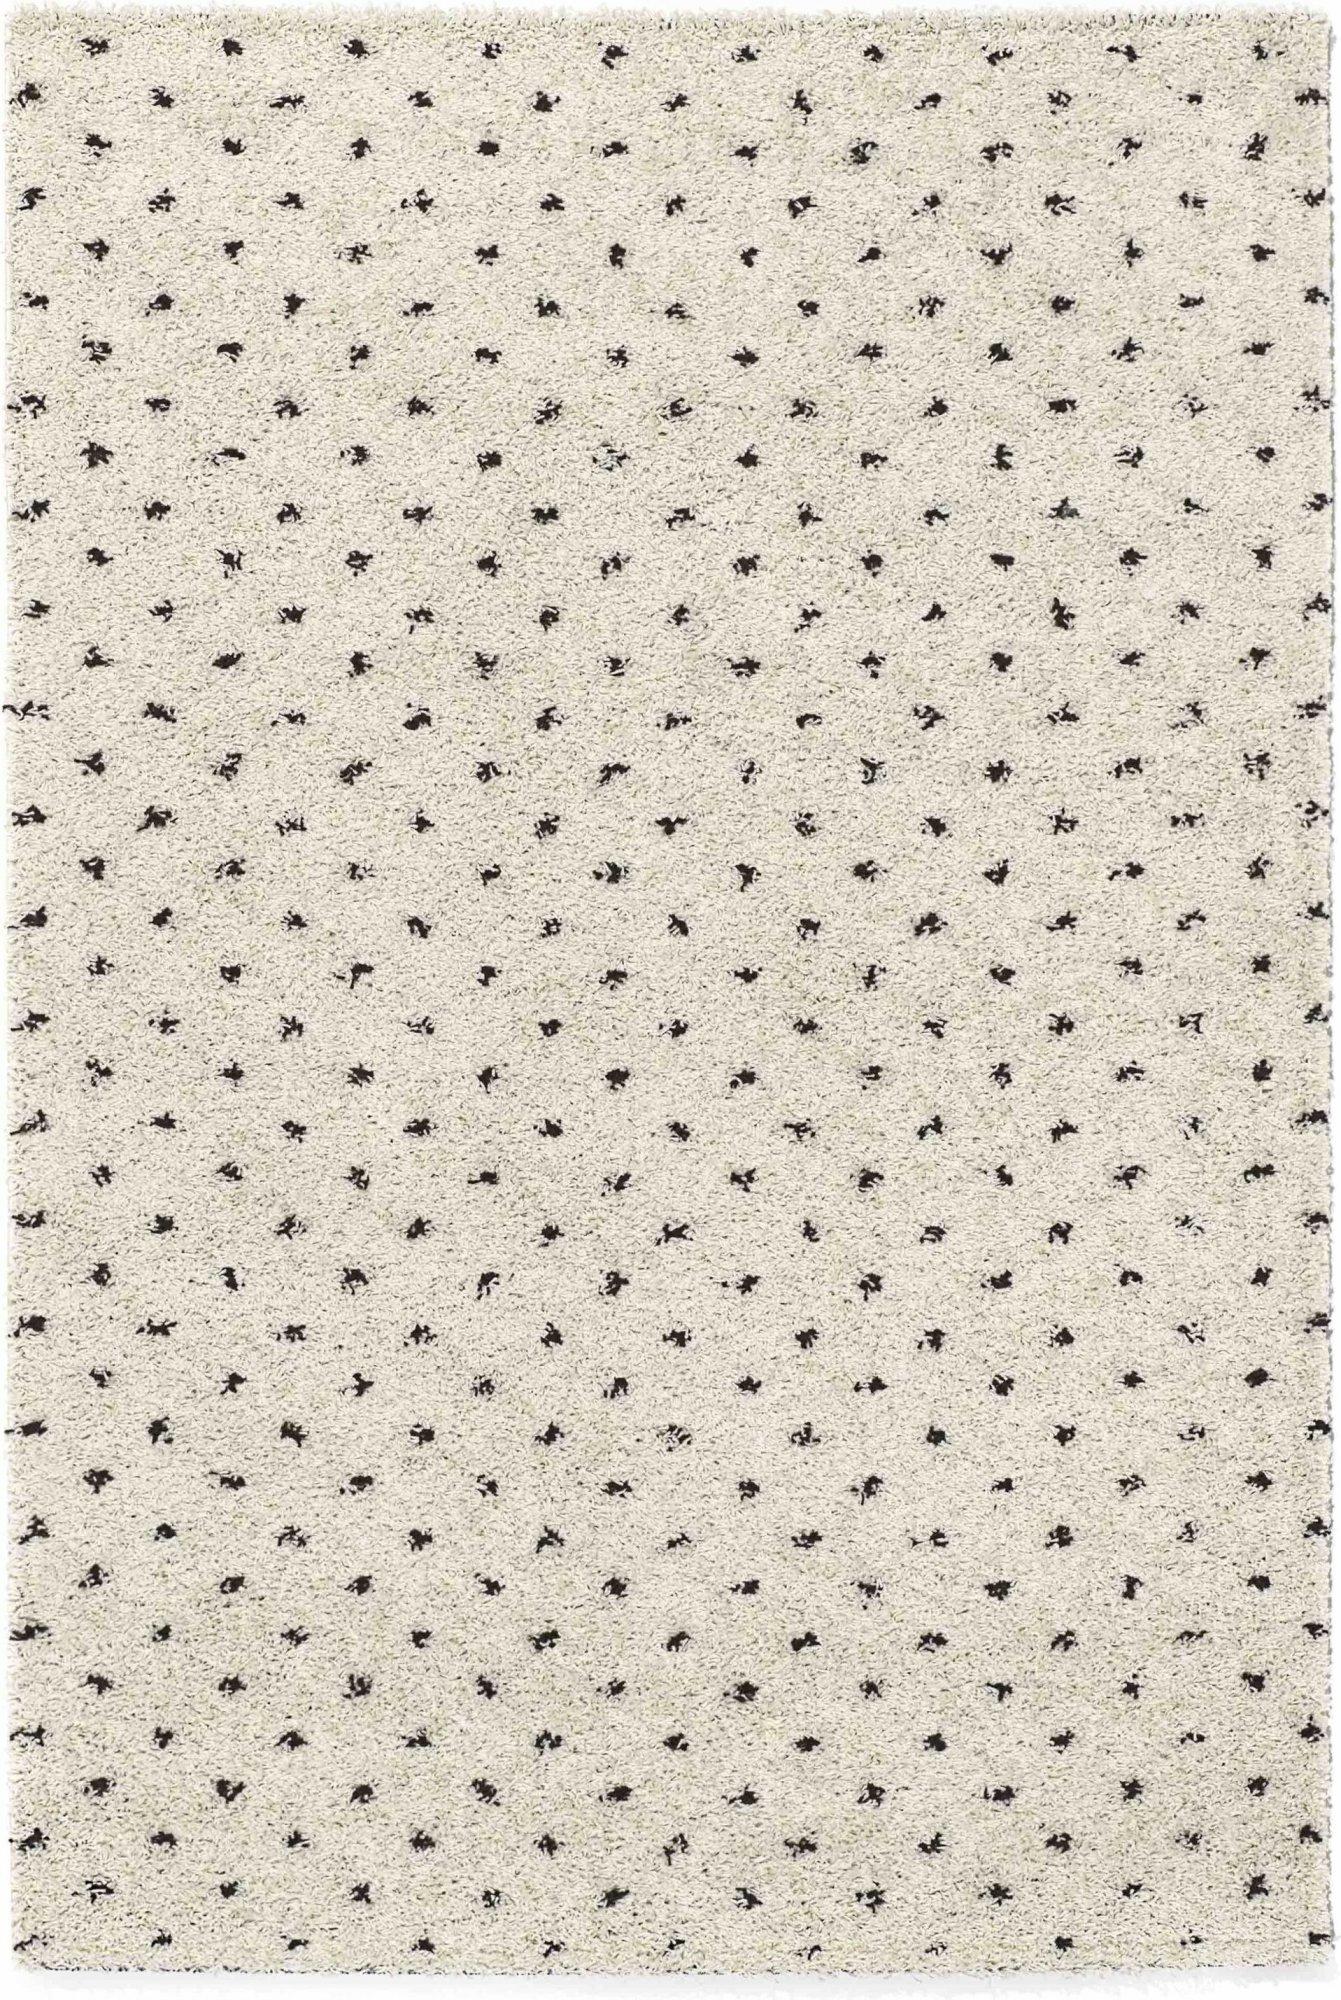 Tapis shaggy polypropylène beige 80x140